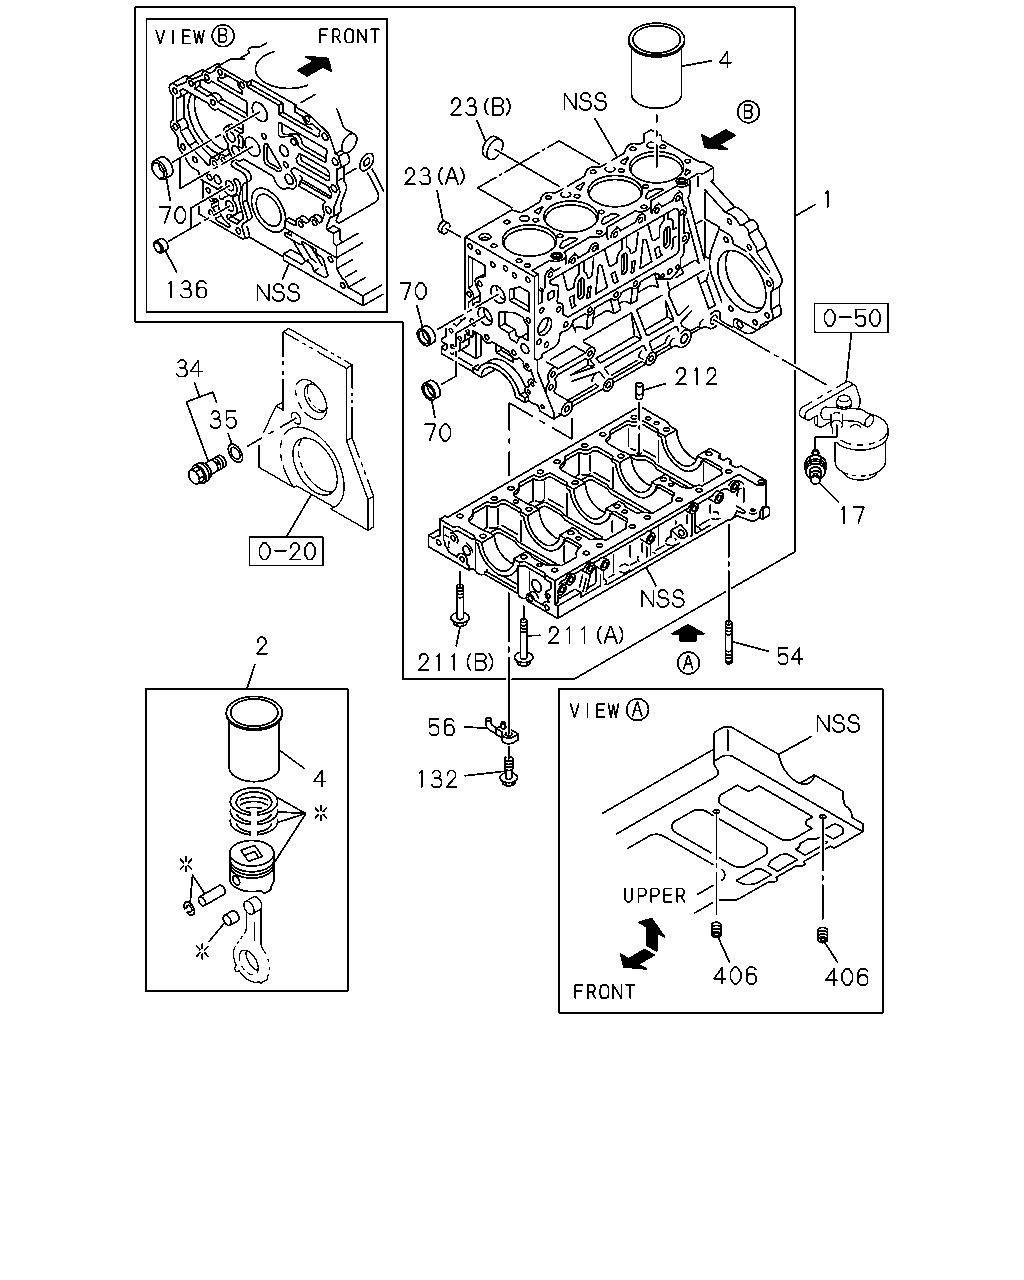 WRG-7447] Isuzu 4he1 Engine Diagram